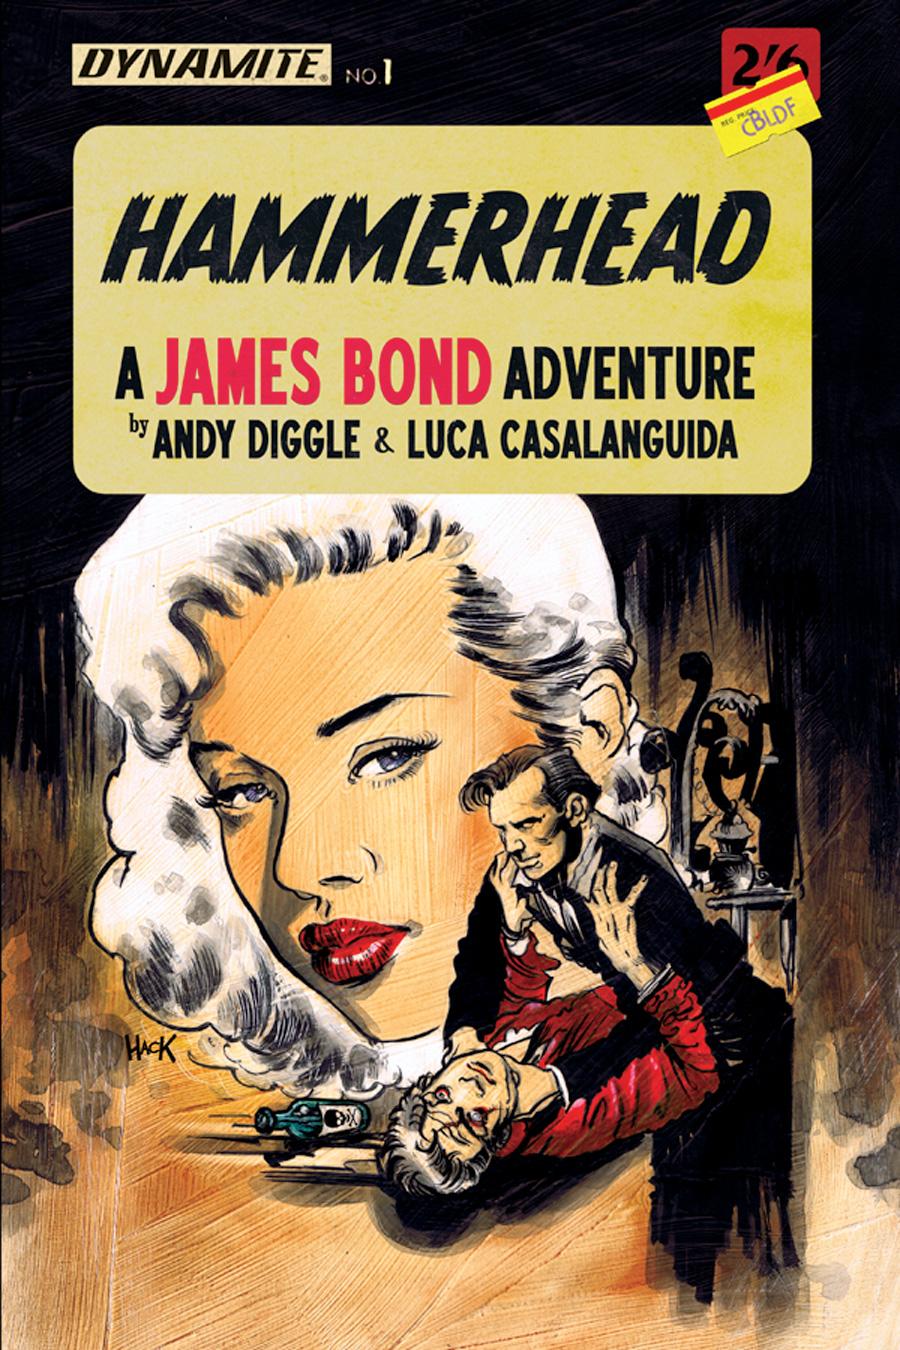 jamesbond-hammerhead-001-exclu-final-cbldf